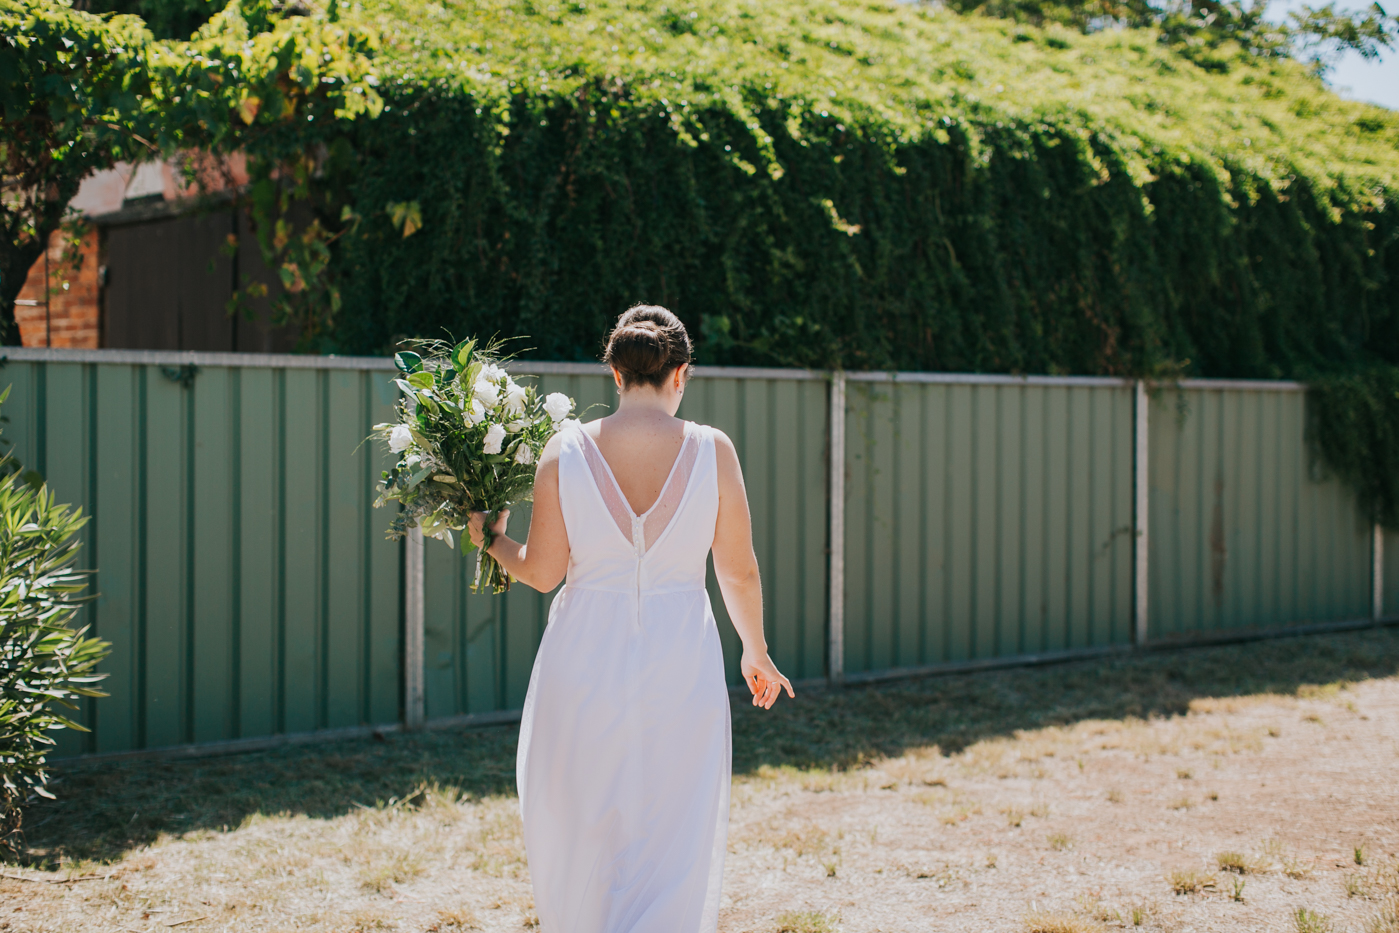 Nicolle & Jacob - Dubbo Wedding - Country Australia - Samantha Heather Photography-58.jpg